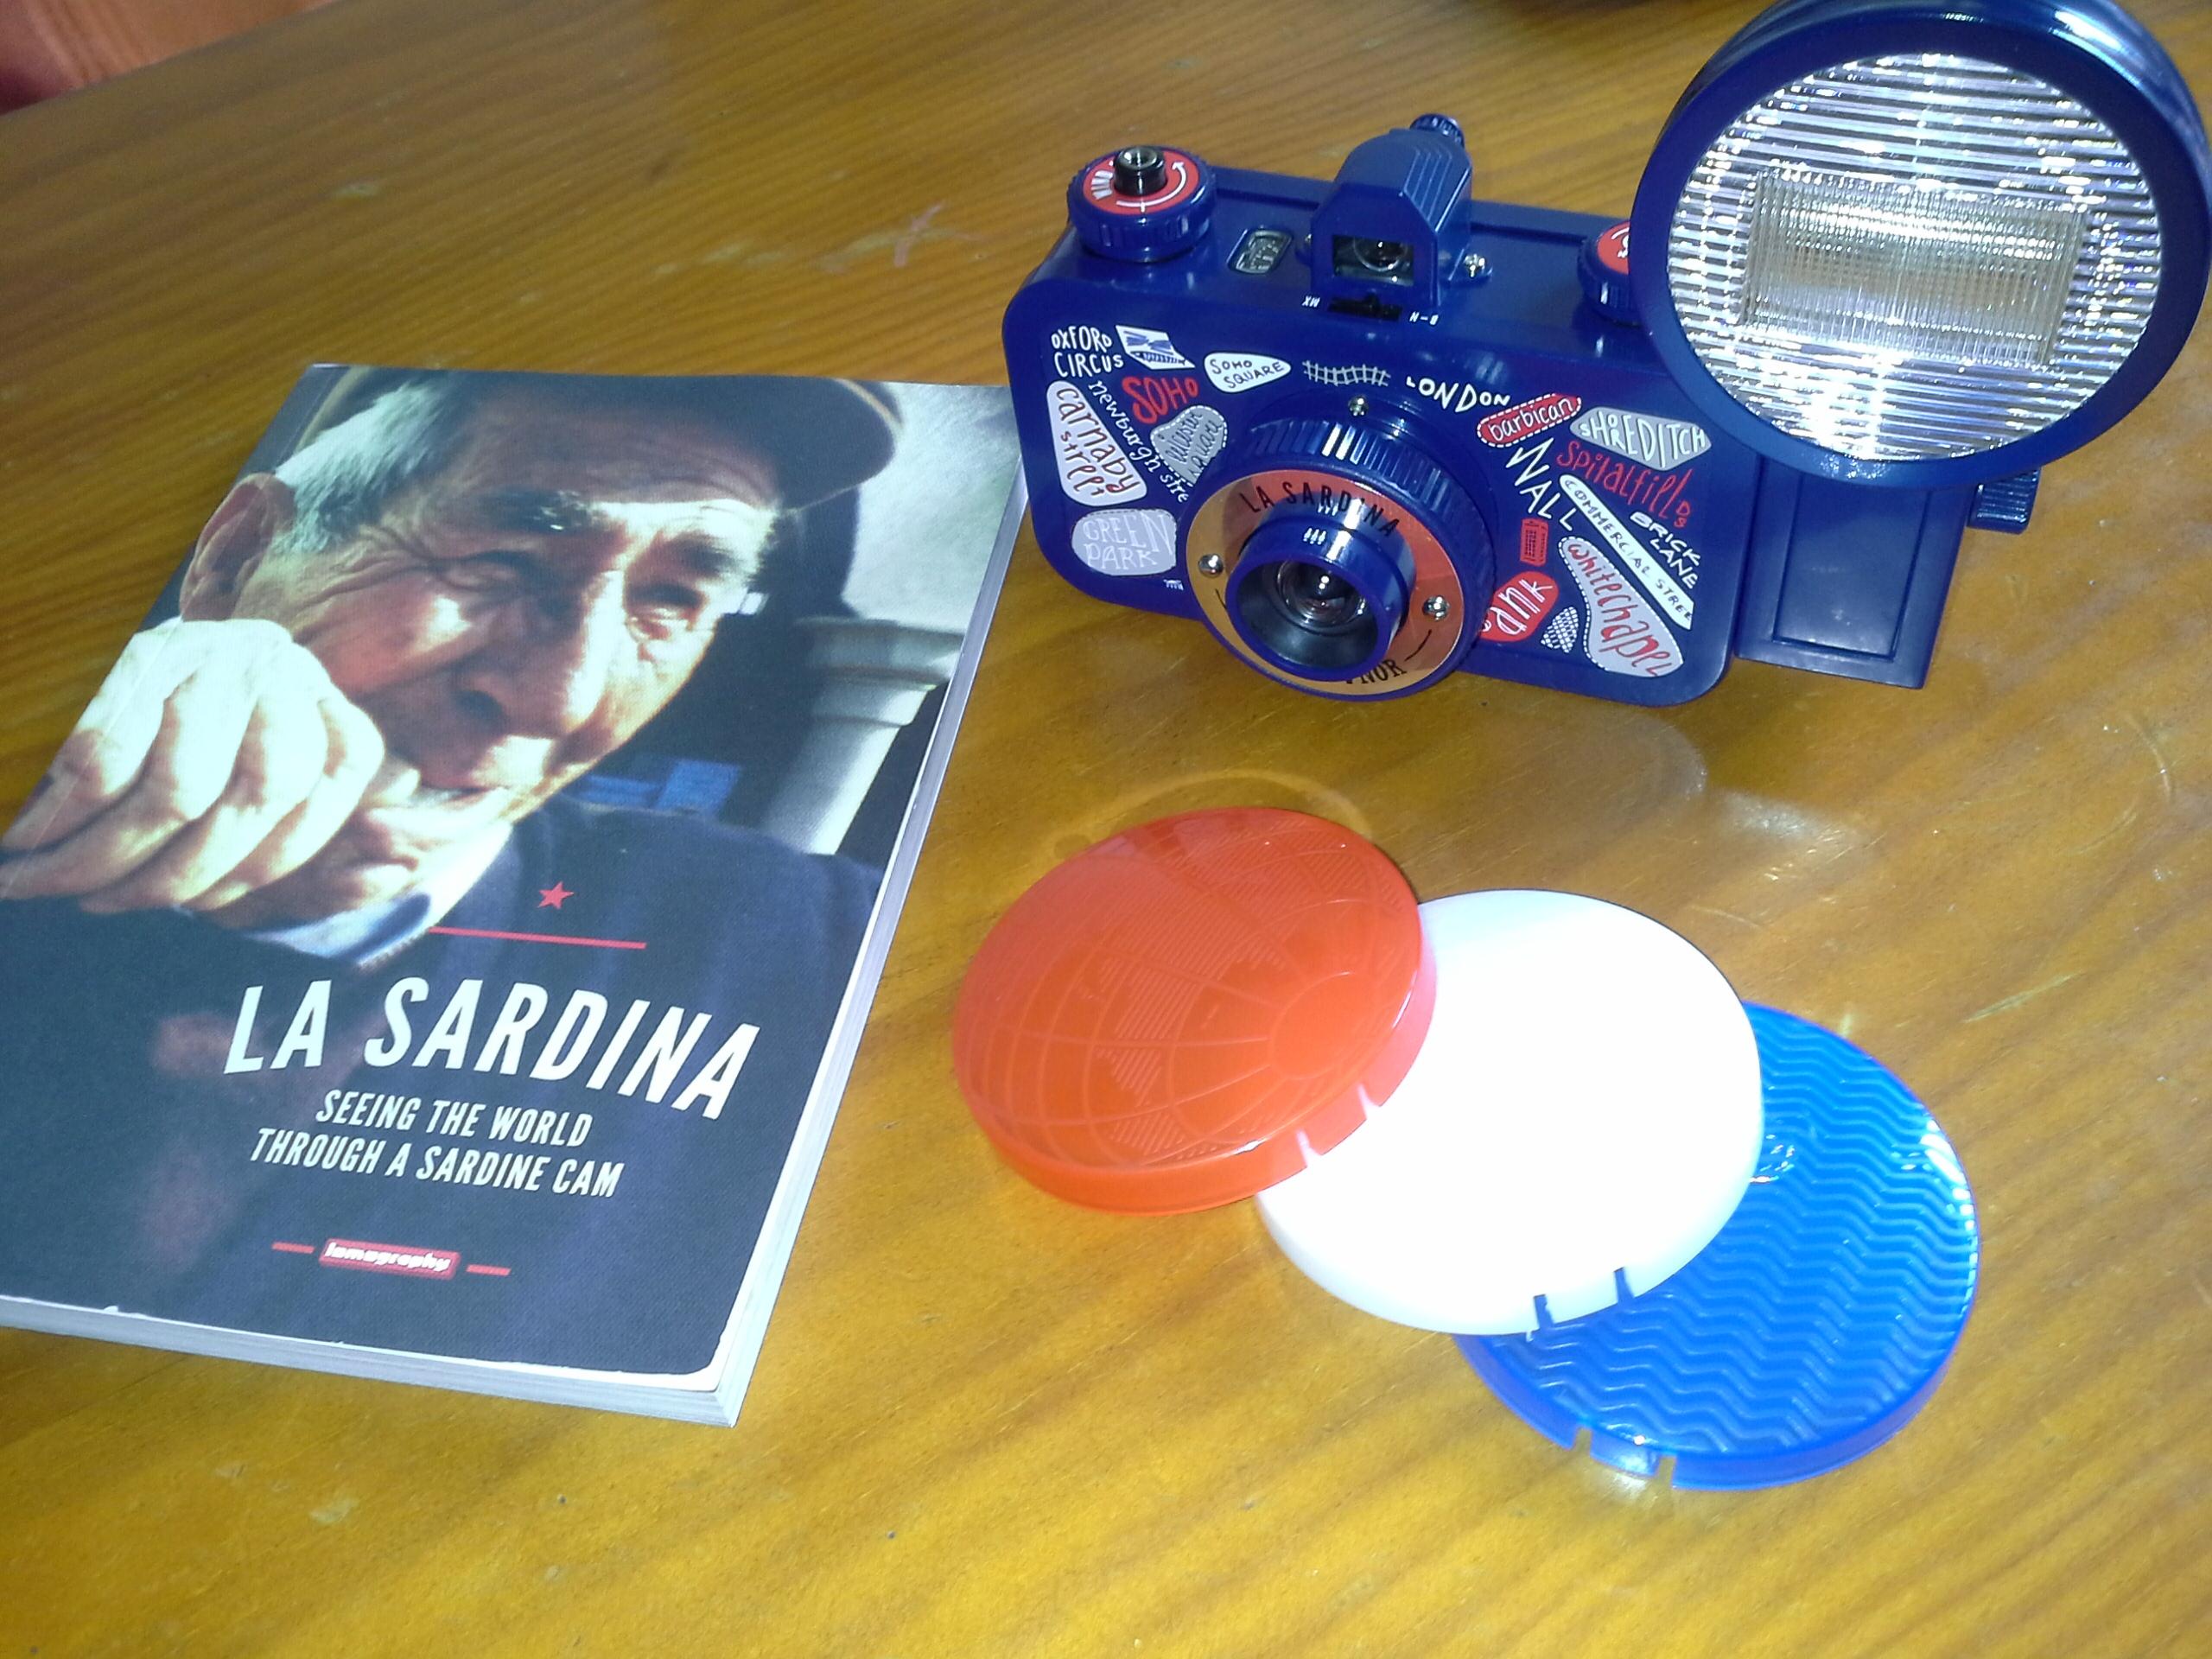 Lomography La Sardina y disfruta de la fotografia